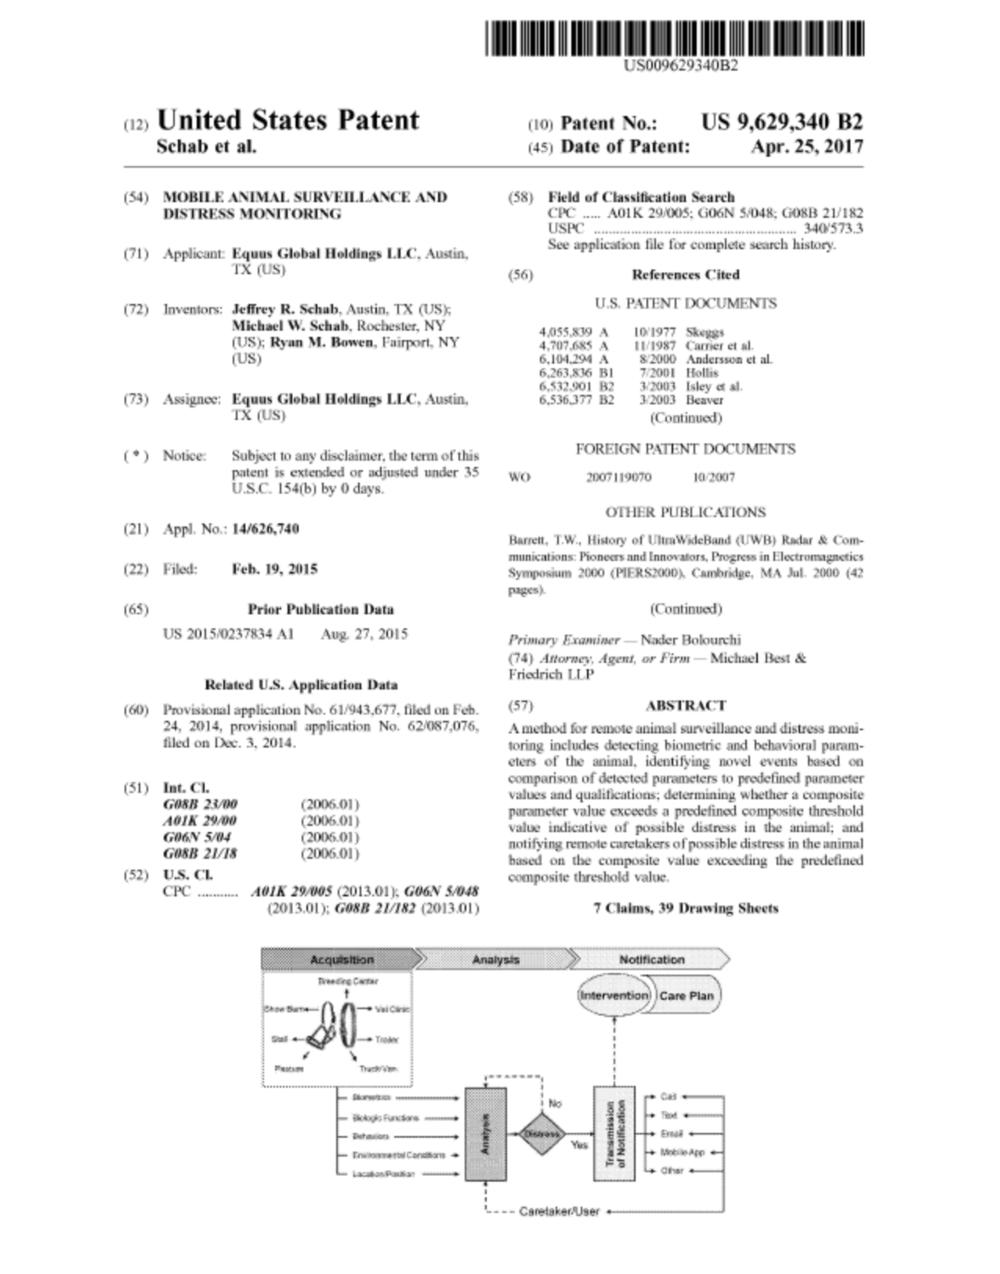 US patent no. 9,629,340